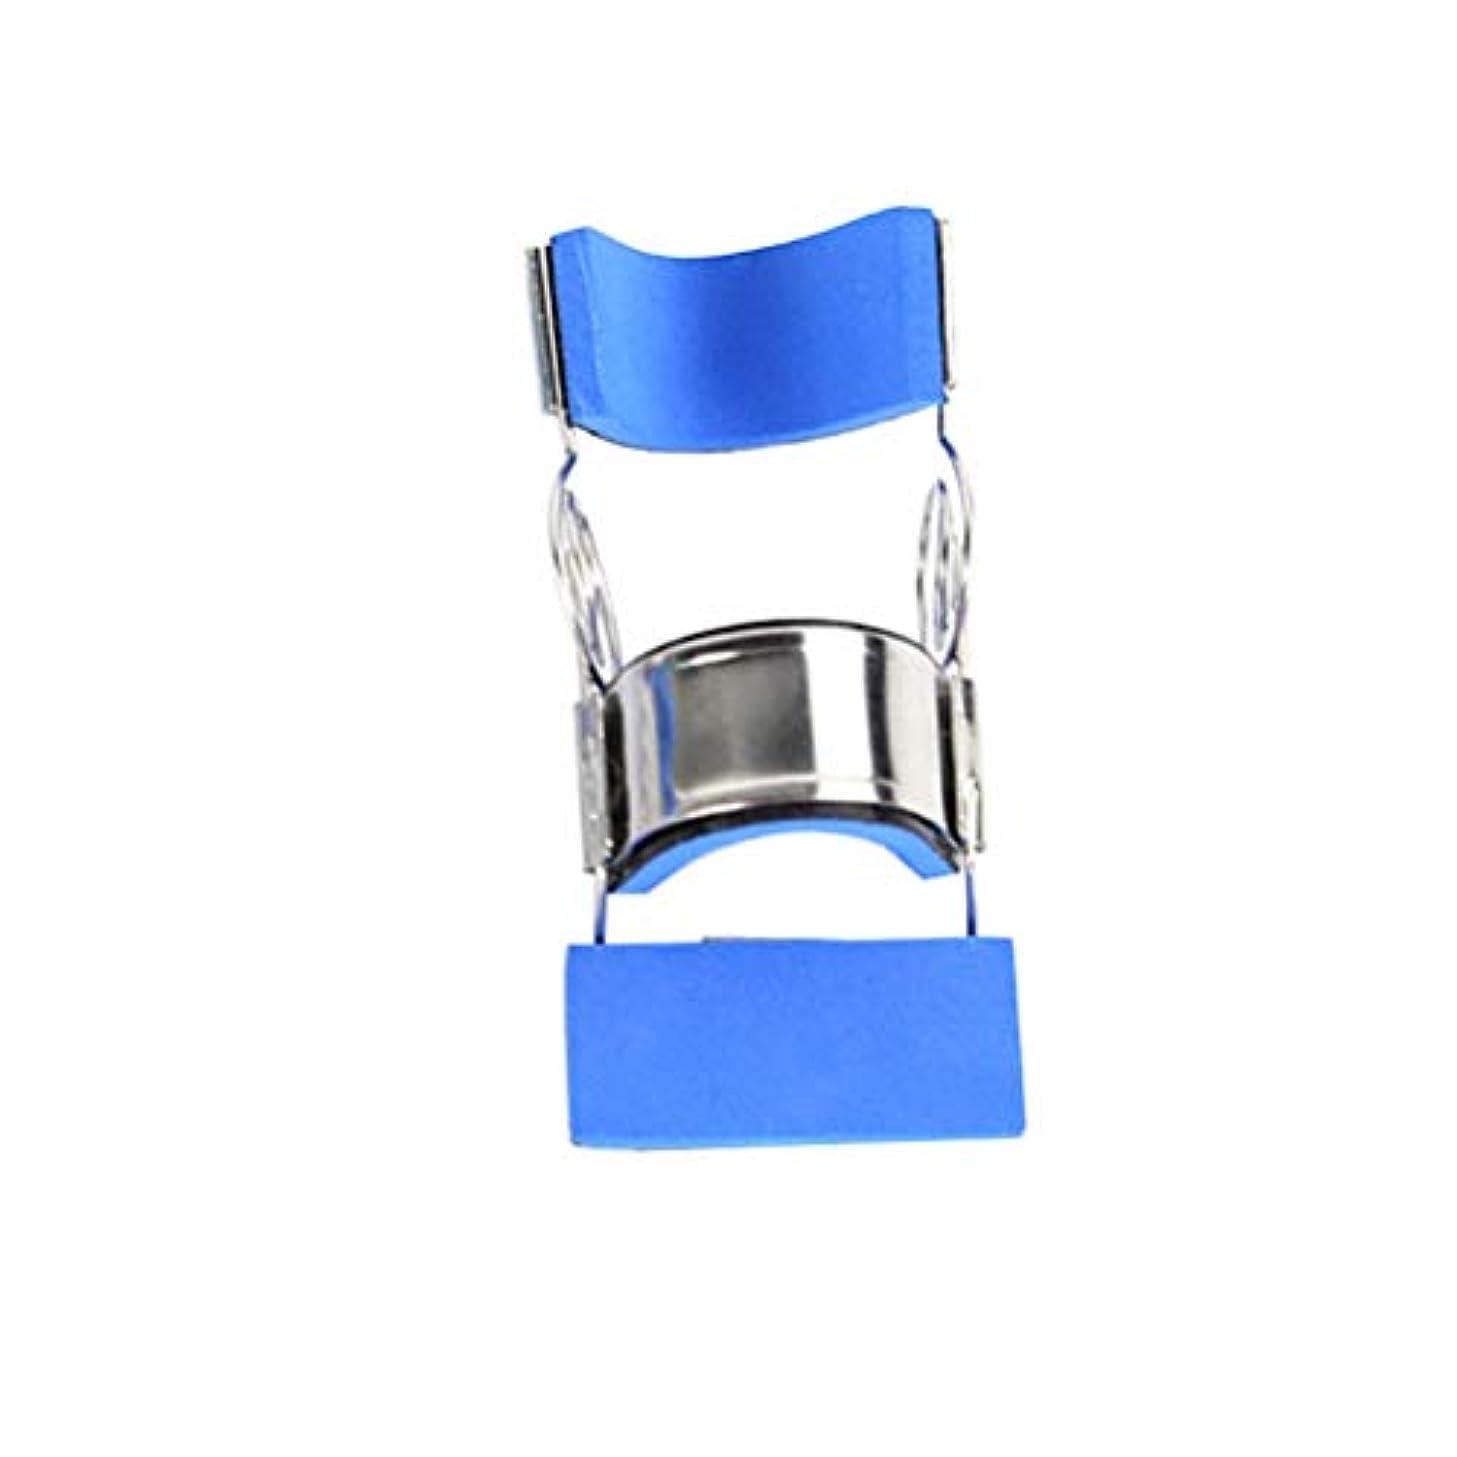 Healifty ステンレス鋼指の添え木可動式まっすぐ指保護スリーブサイズL